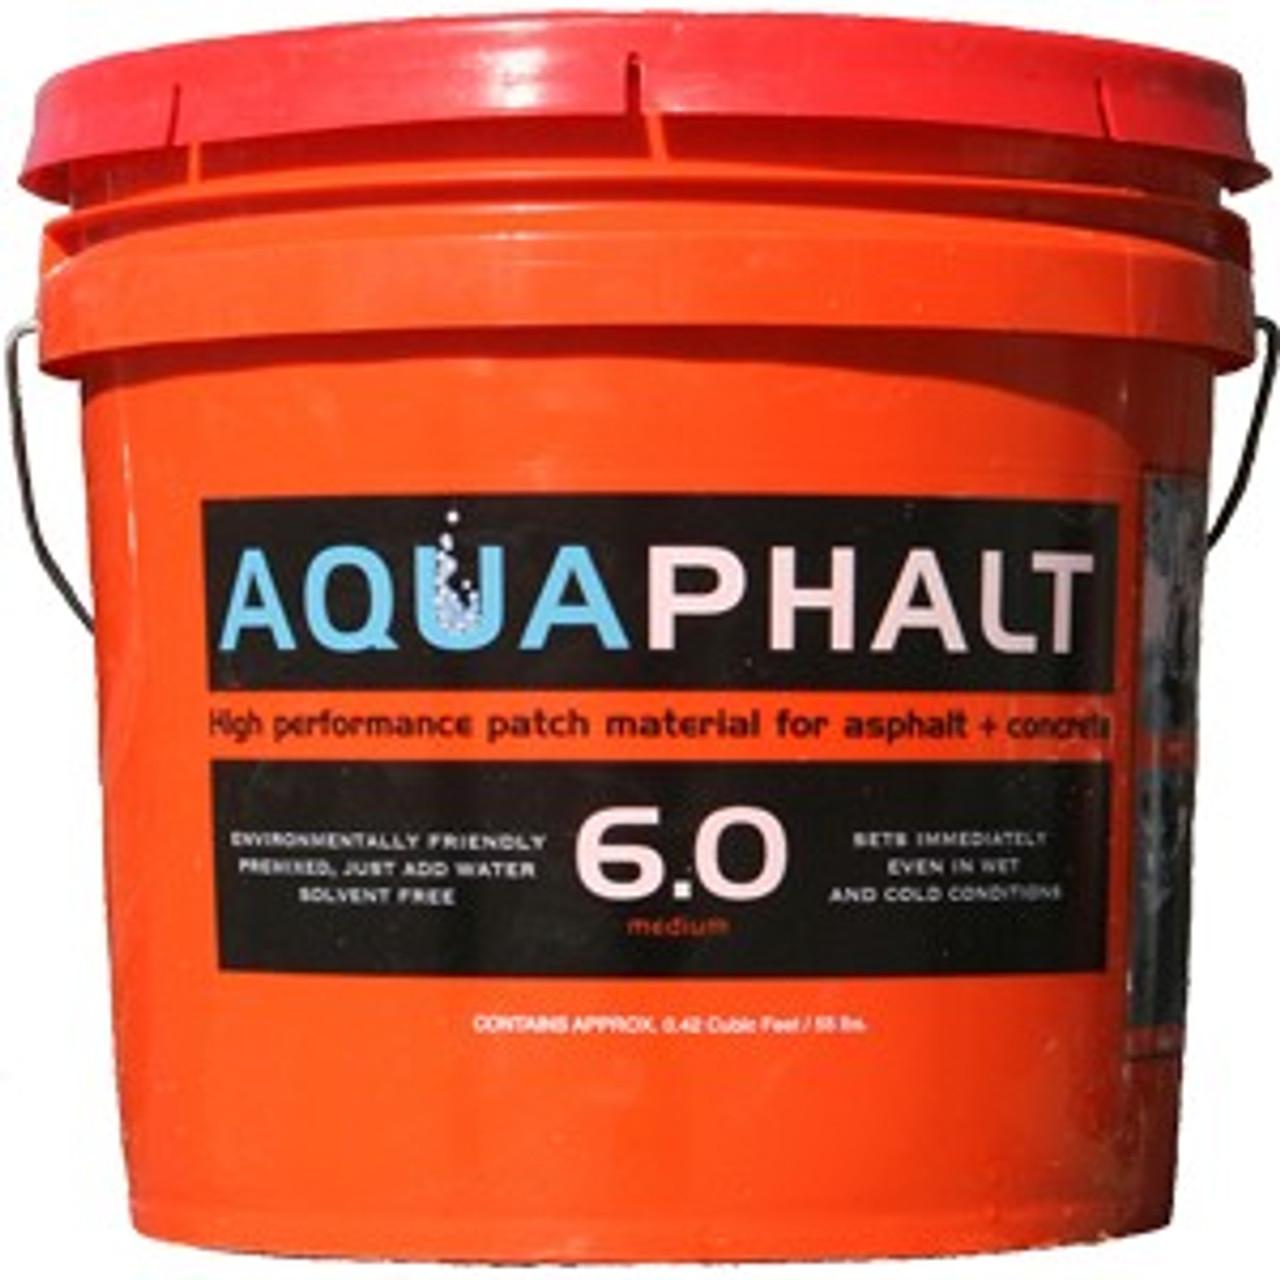 Aquaphalt 6.0 3.5G Black Permanent Asphalt Repair